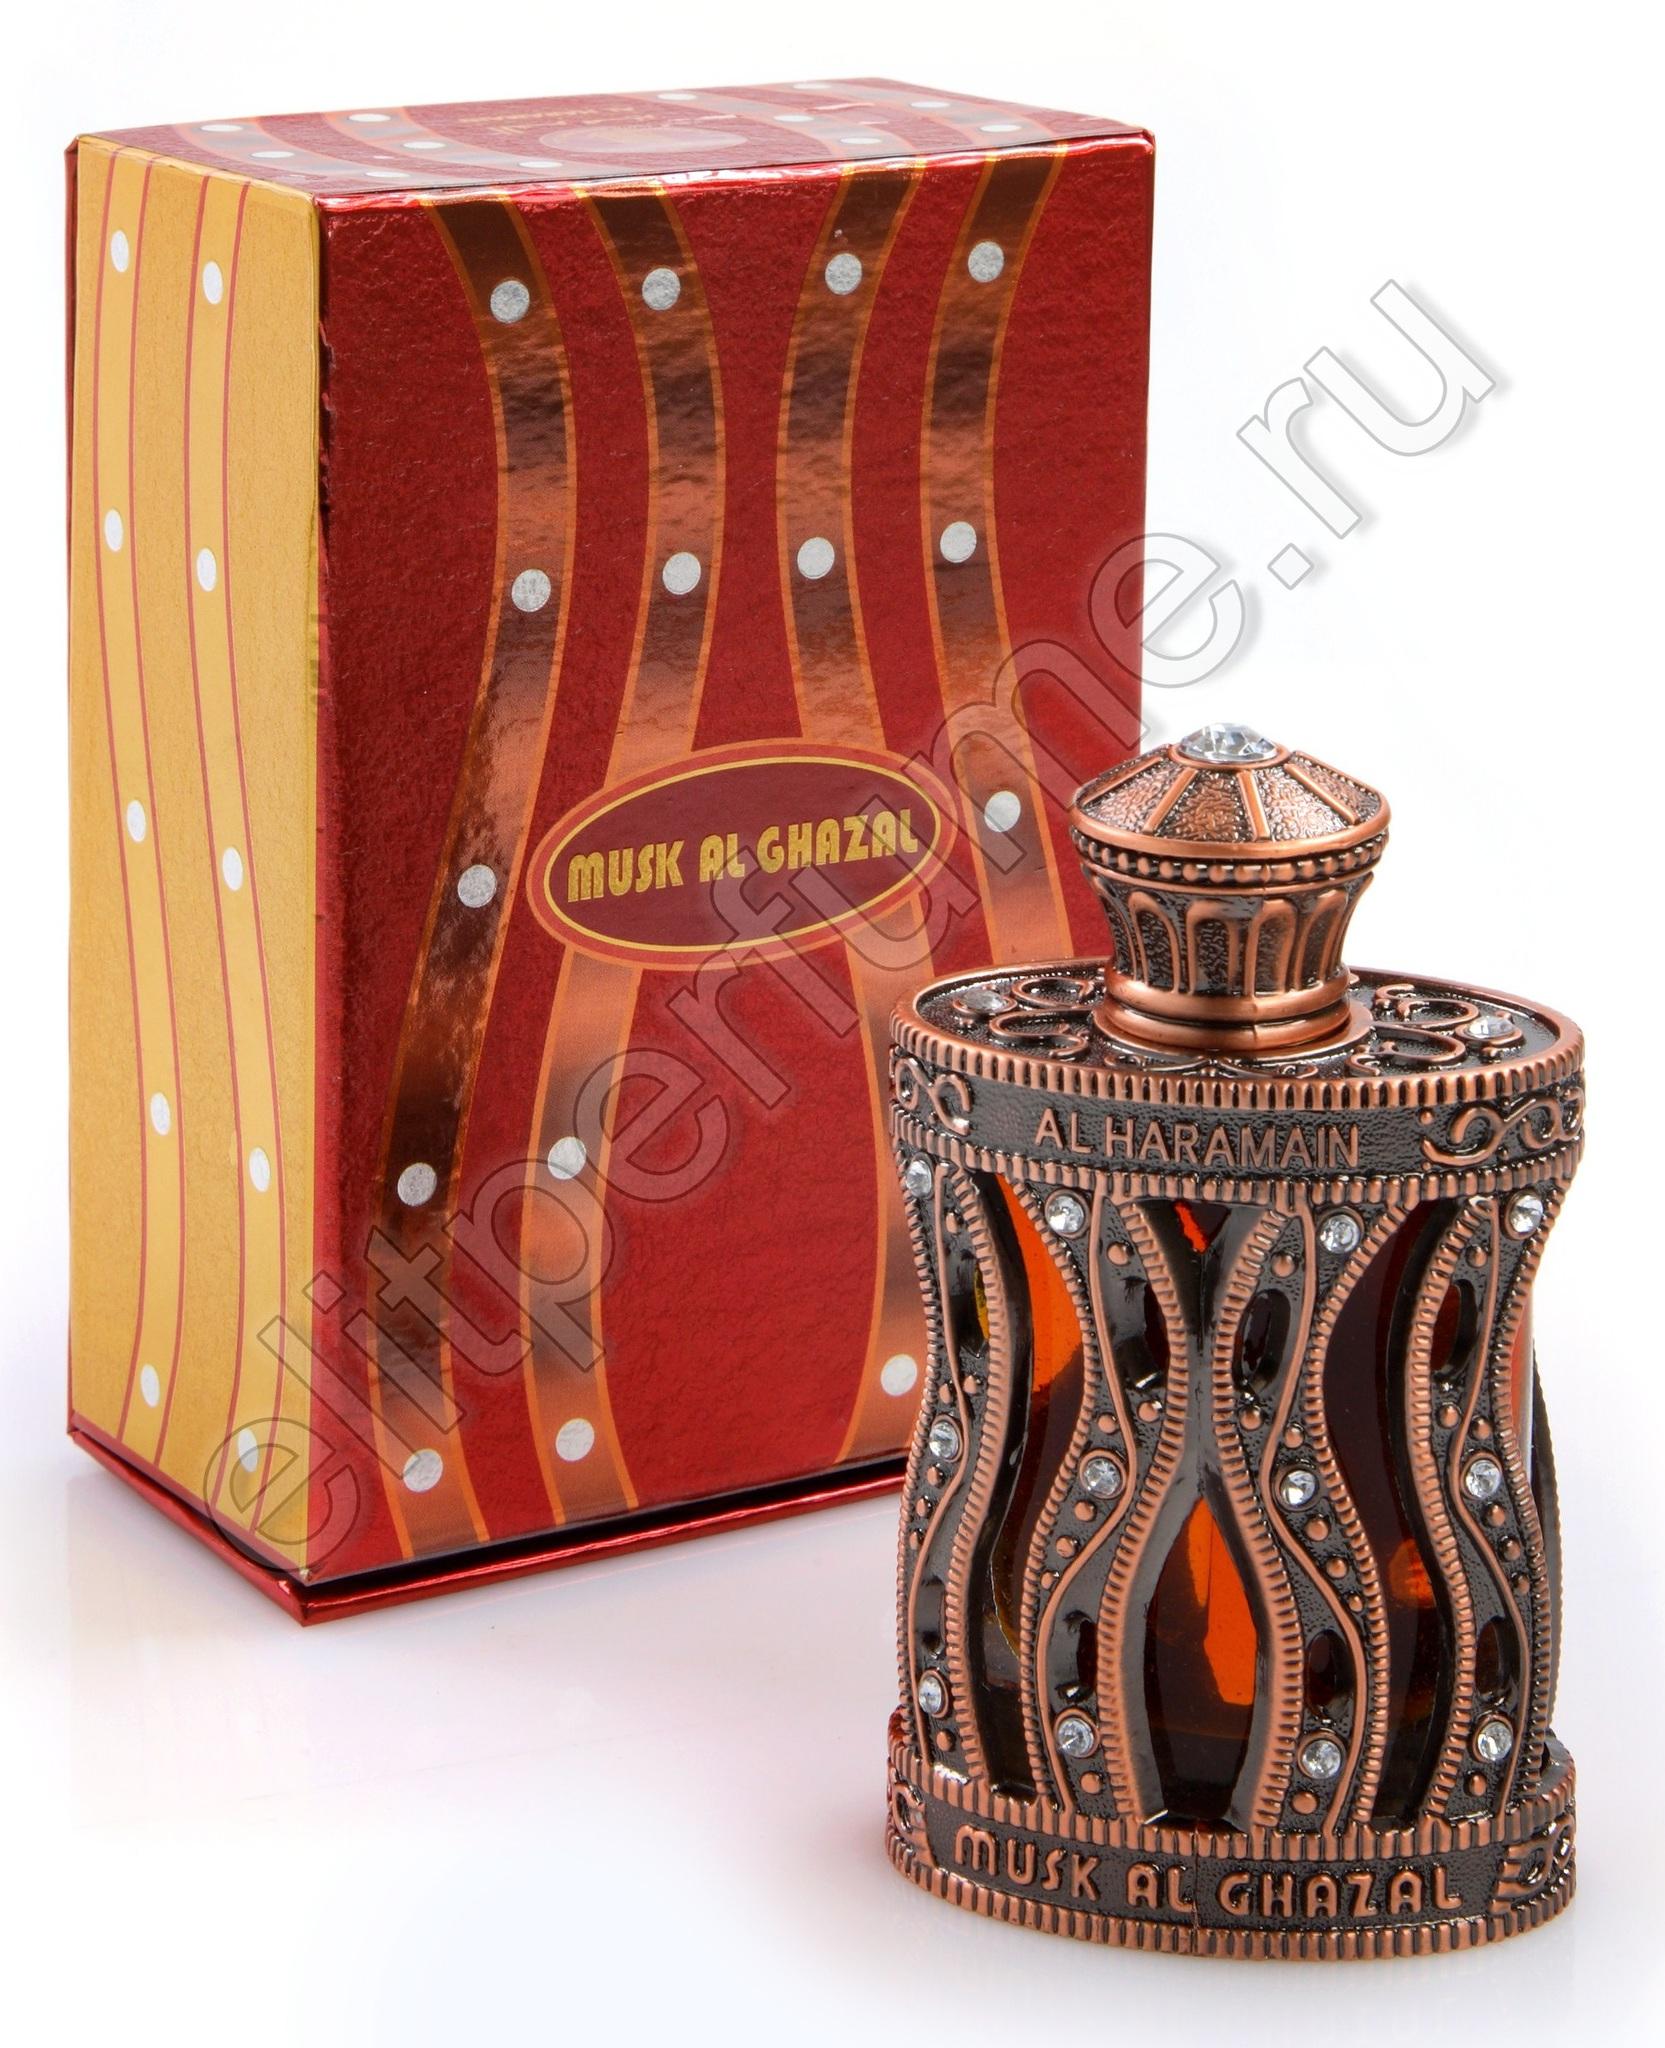 Мускус Аль-Газаль / Musk Al Ghazal 30 мл арабские масляные духи от Аль Харамайн Al Haramain Perfumes